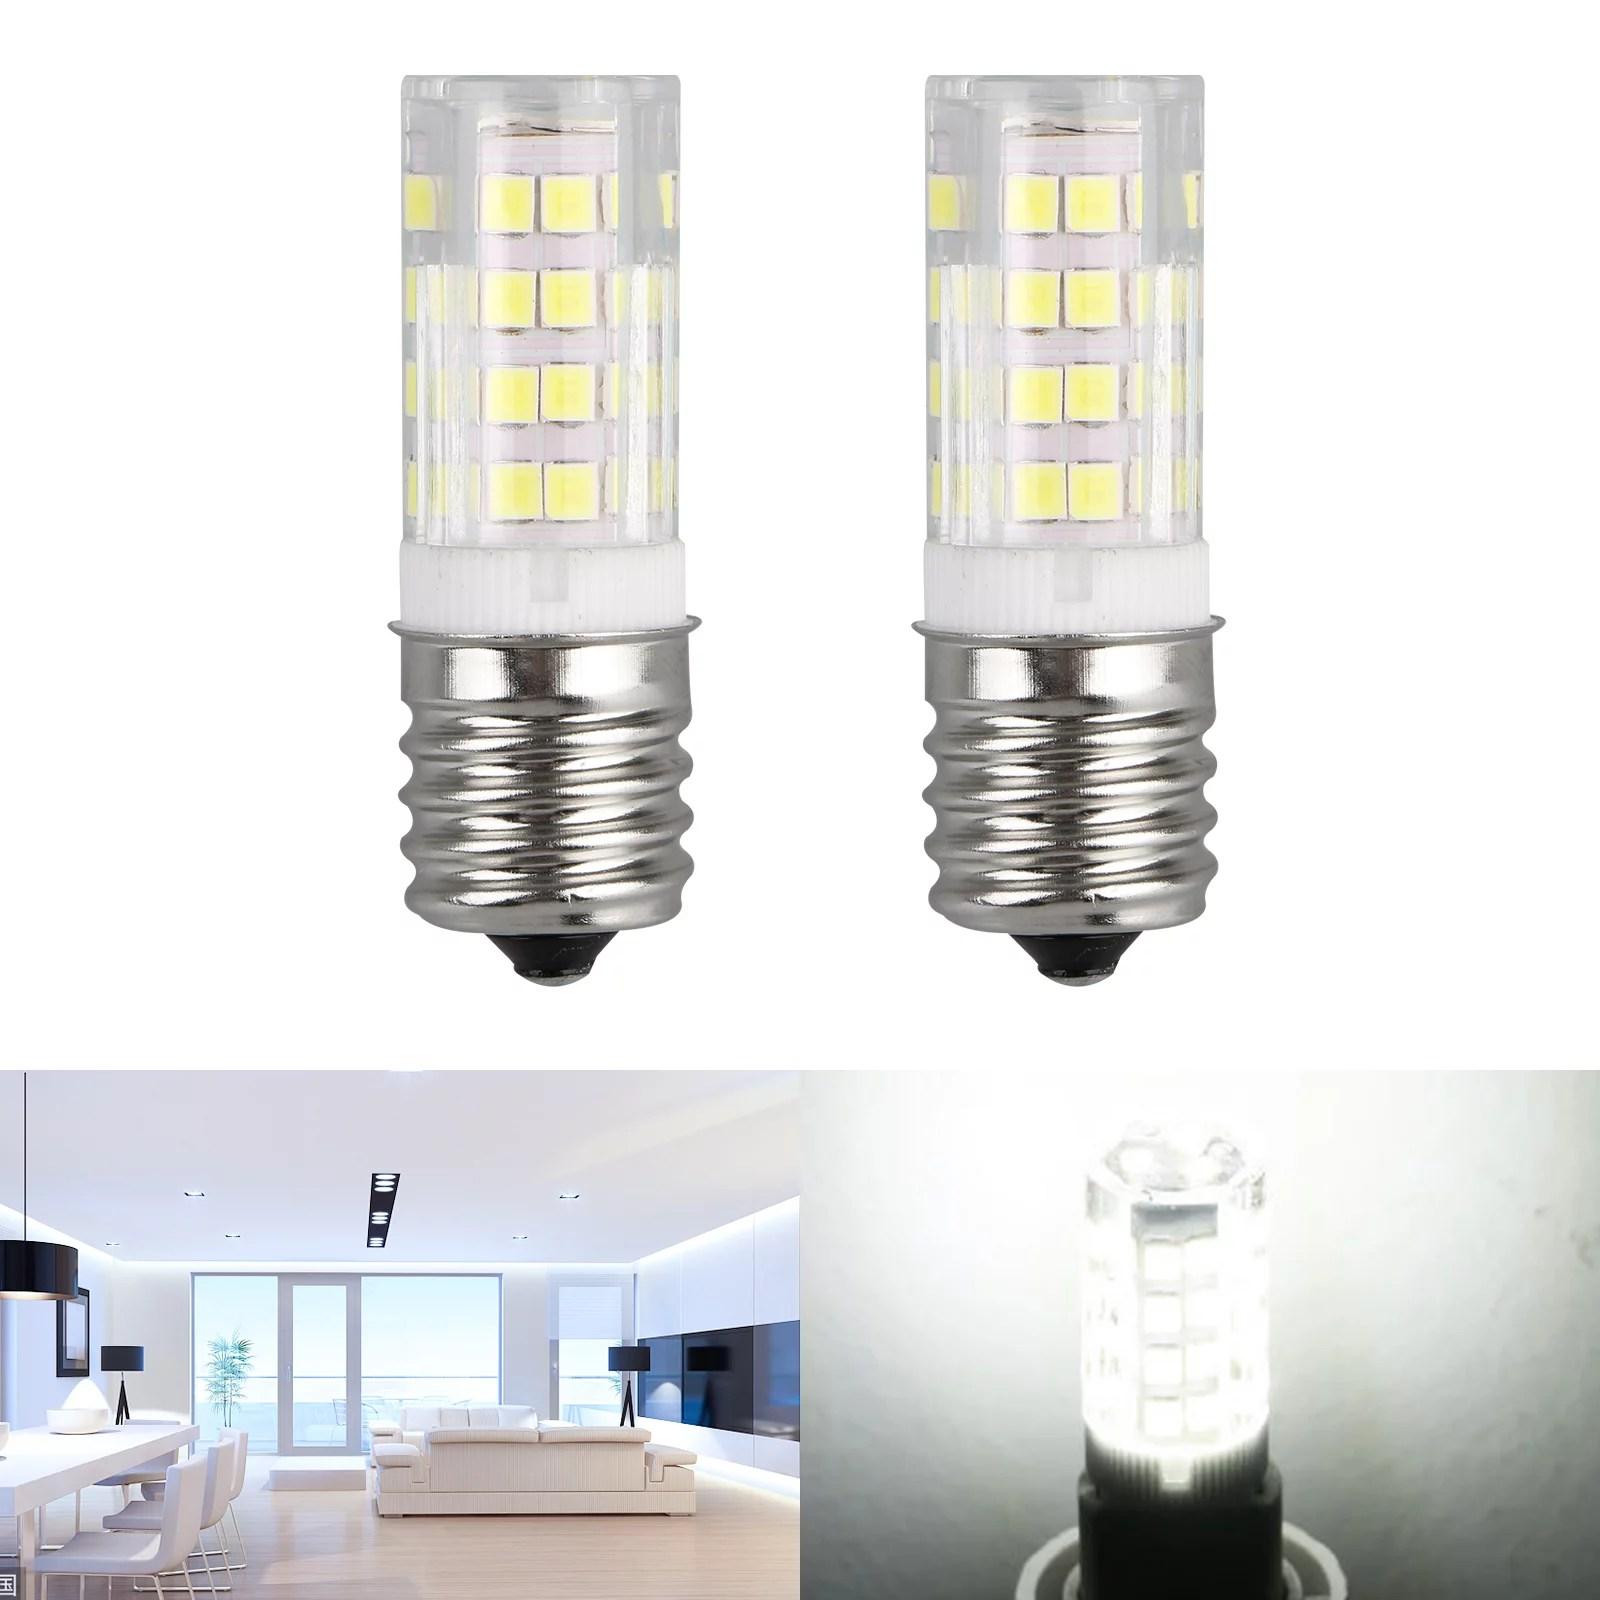 4 2pcs white dimmable e17 led bulb microwave oven appliance light bulb intermediate base bulb 4w 40w halogen bulb equivalent daylight white 6000k